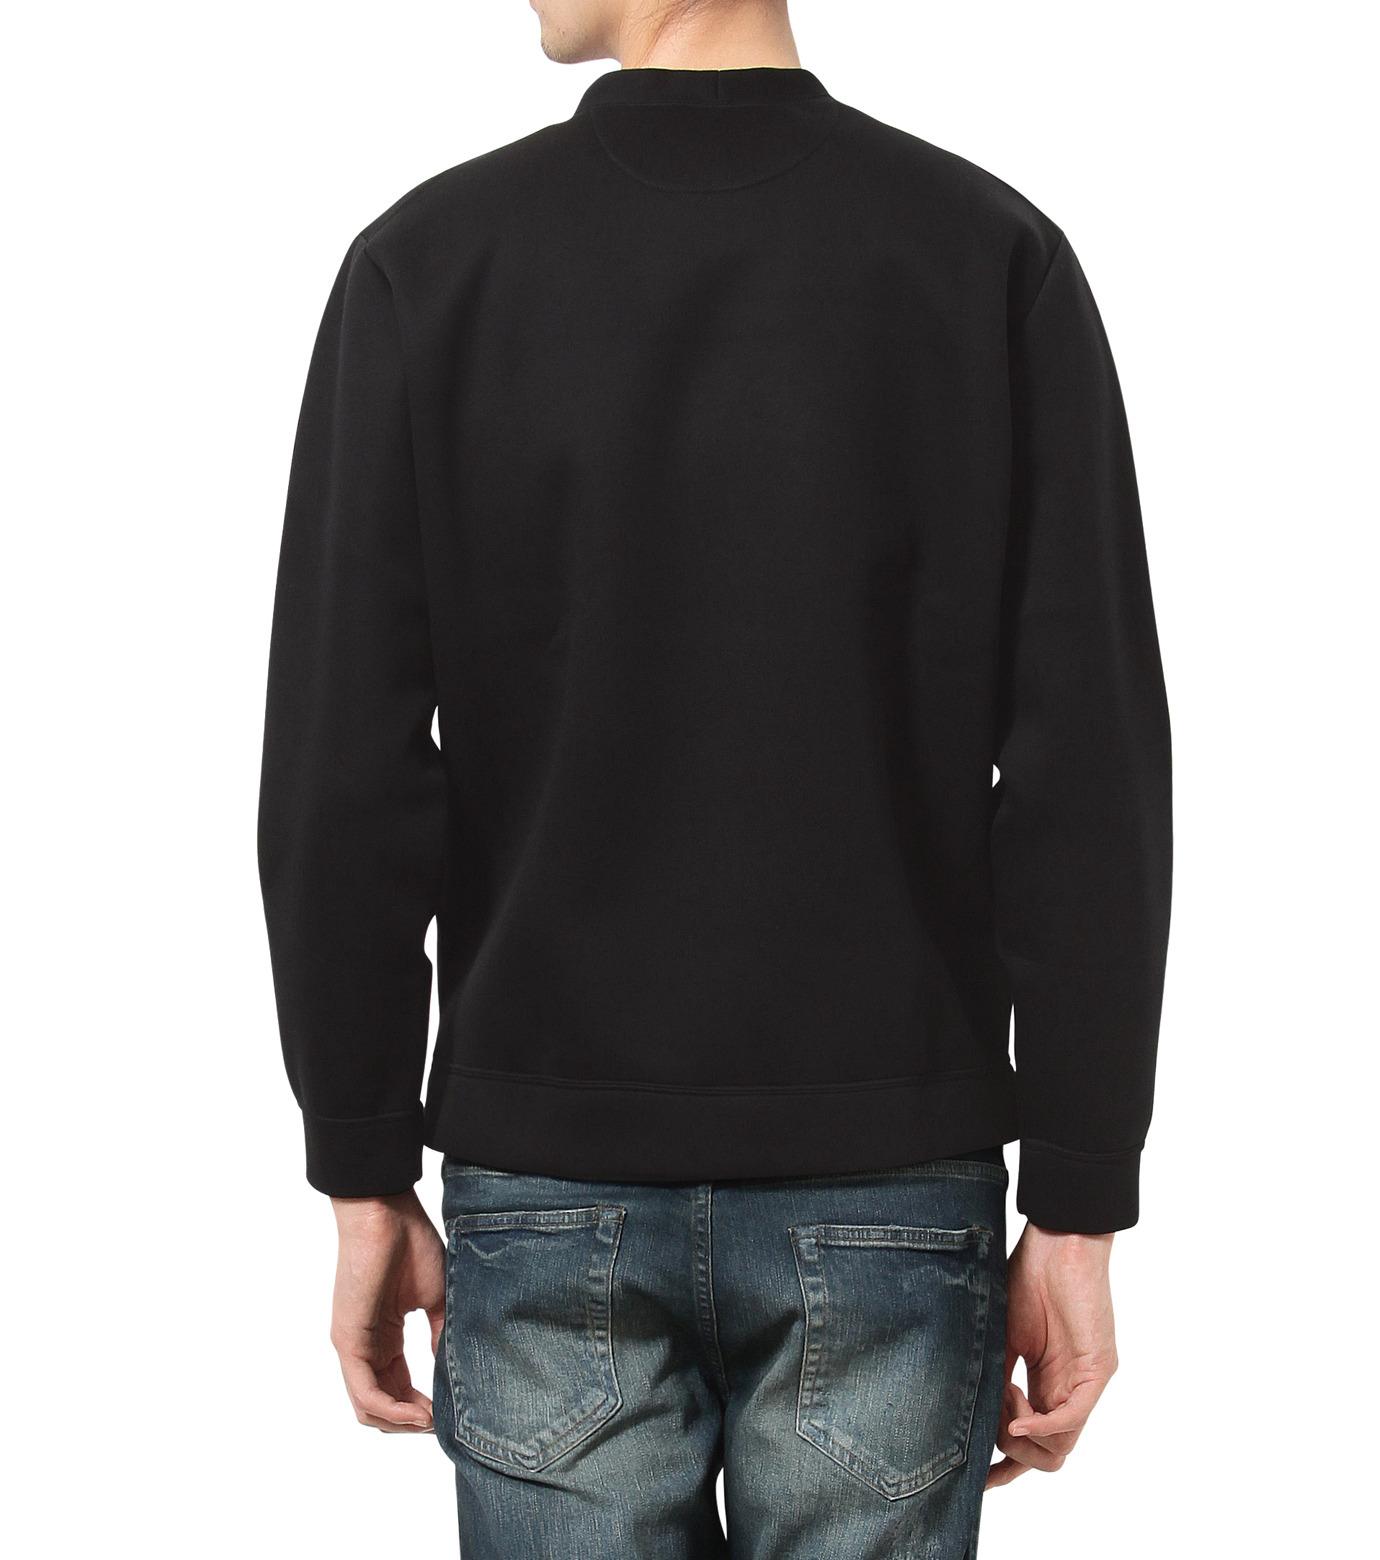 HL HEDDIE LOVU(エイチエル・エディールーヴ)のBONDING SWEATSHIRT-BLACK(カットソー/cut and sewn)-18S92001-13 拡大詳細画像2